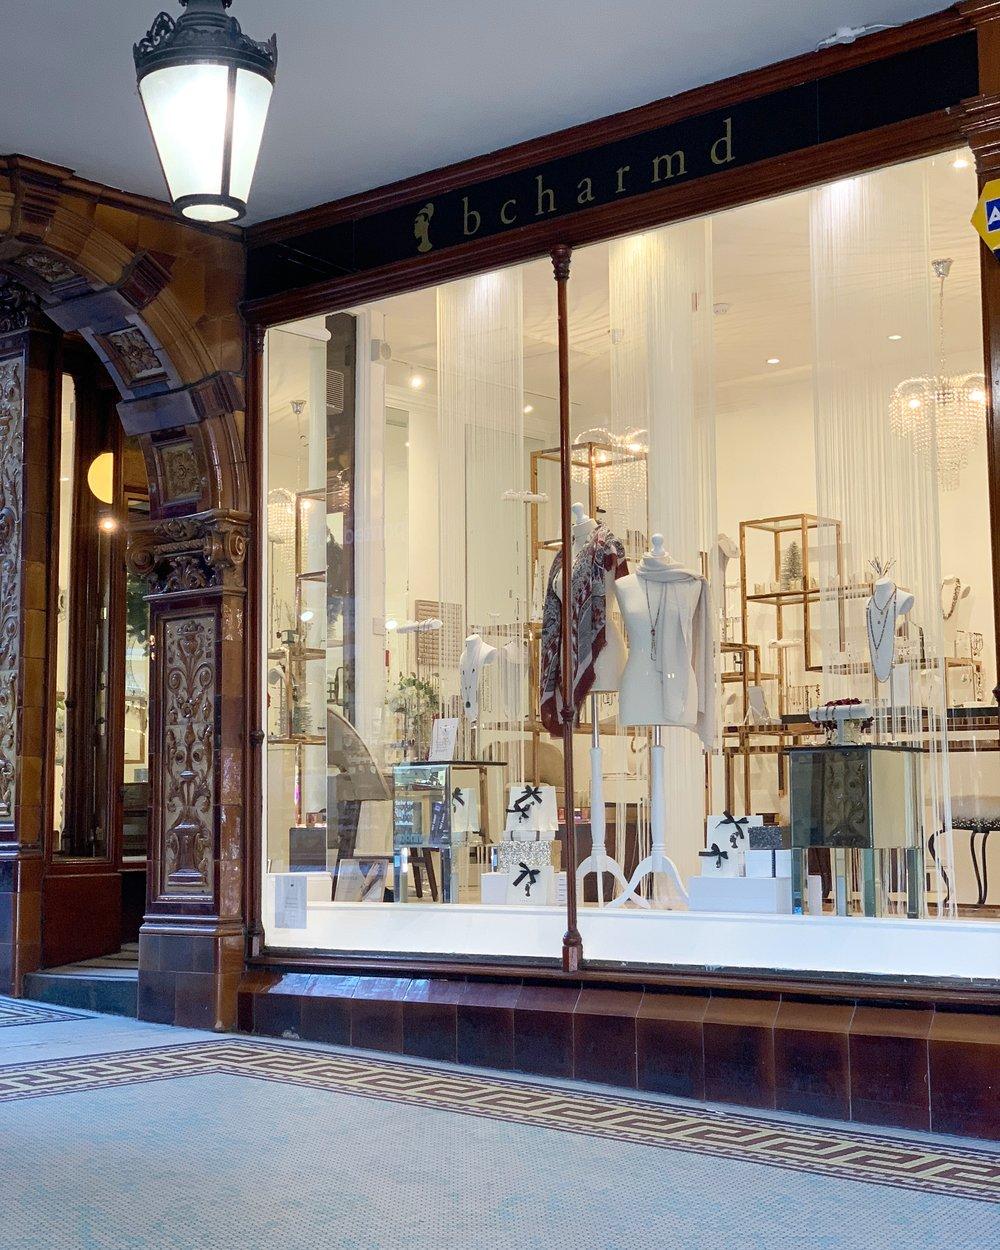 Bcharmd Boutique